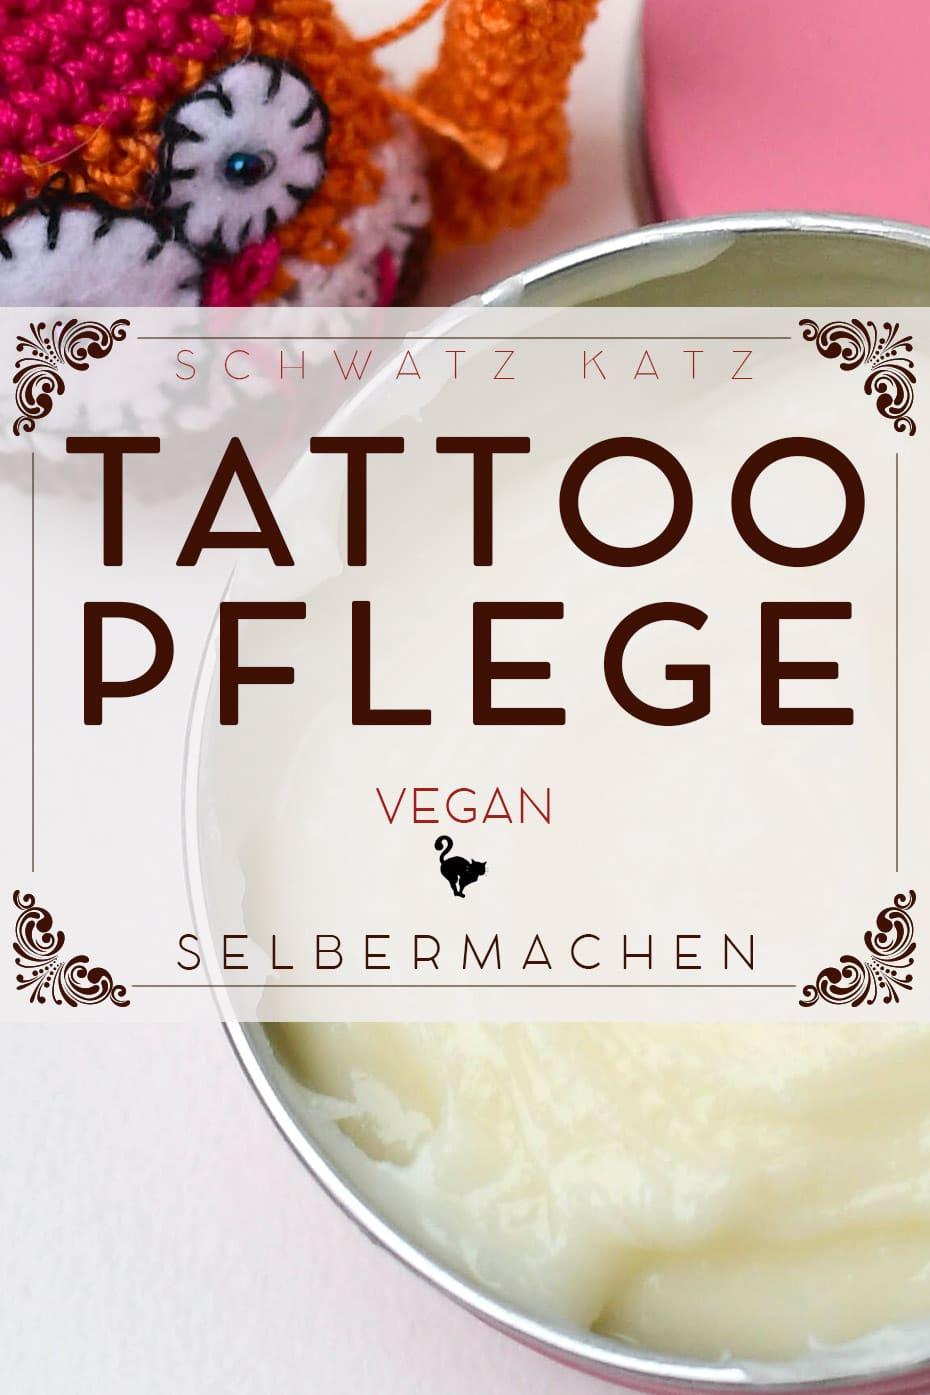 Vegane Tattoopflege mit Avocadin & Aloe Vera | Schwatz Katz